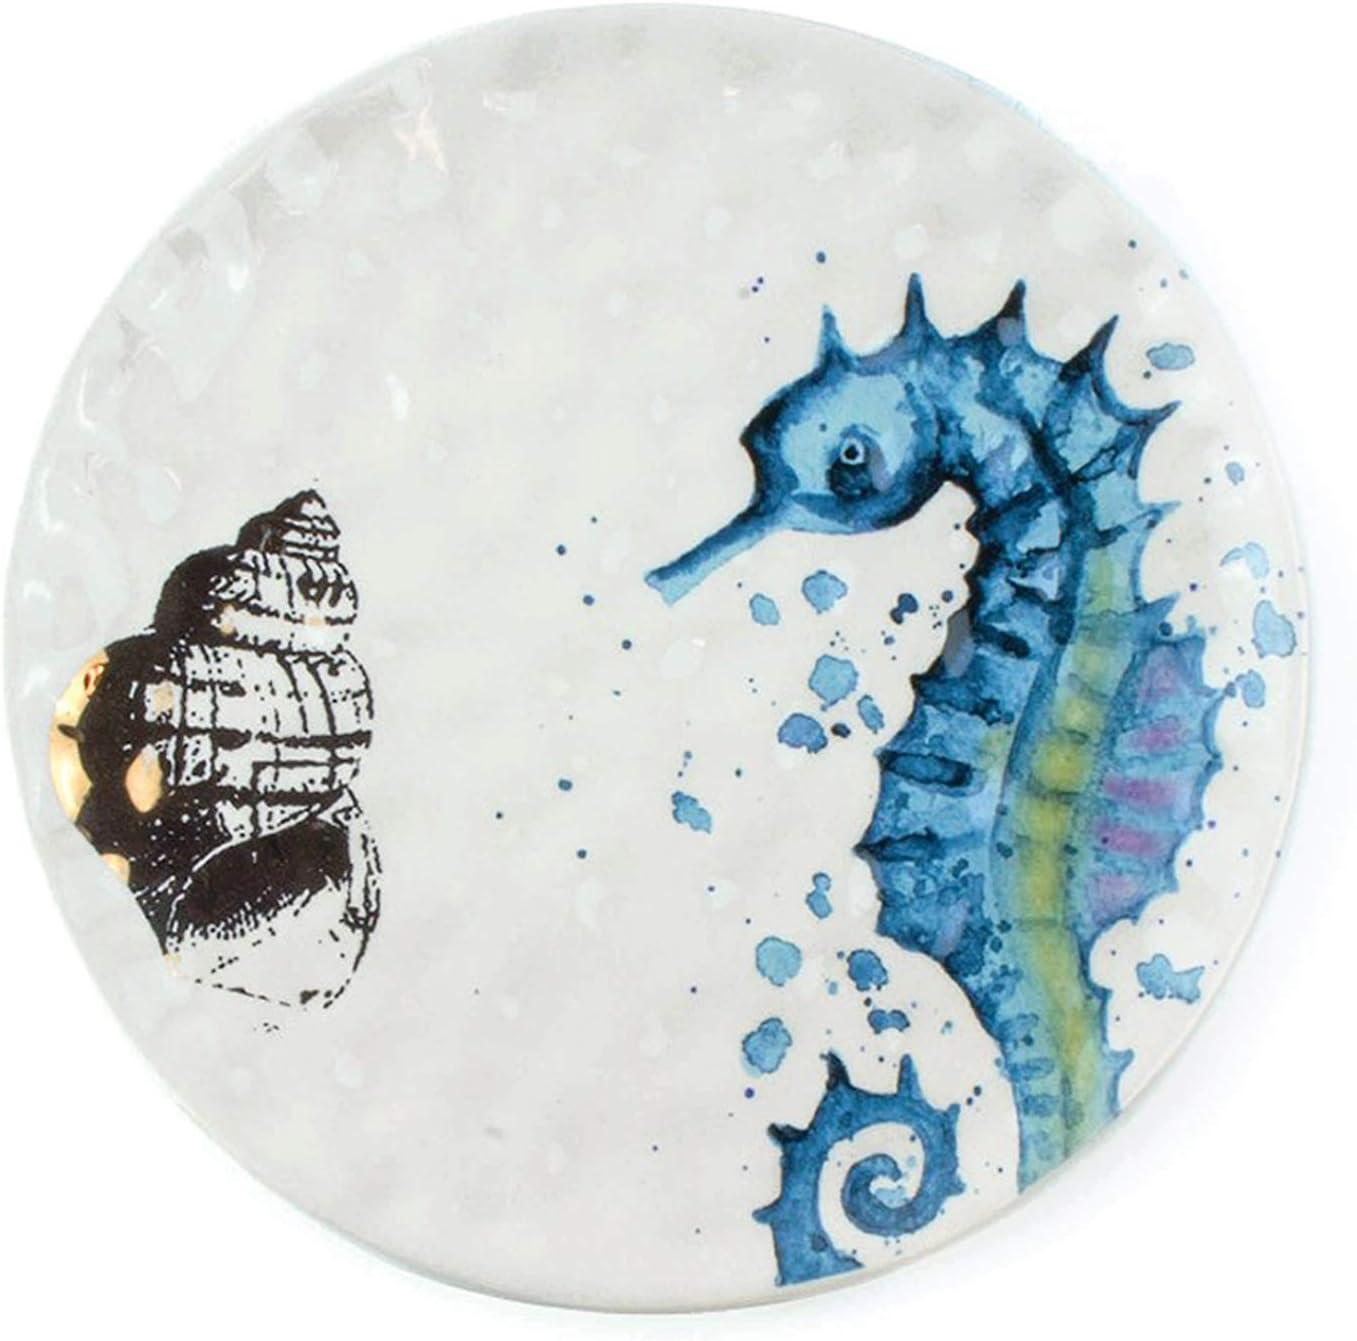 Amazon Com Kitchen Decor Beach Decorations For Home Wall Hanging Coastal Novelty Plates Seahorse Ceramic Decorative Plate Dining